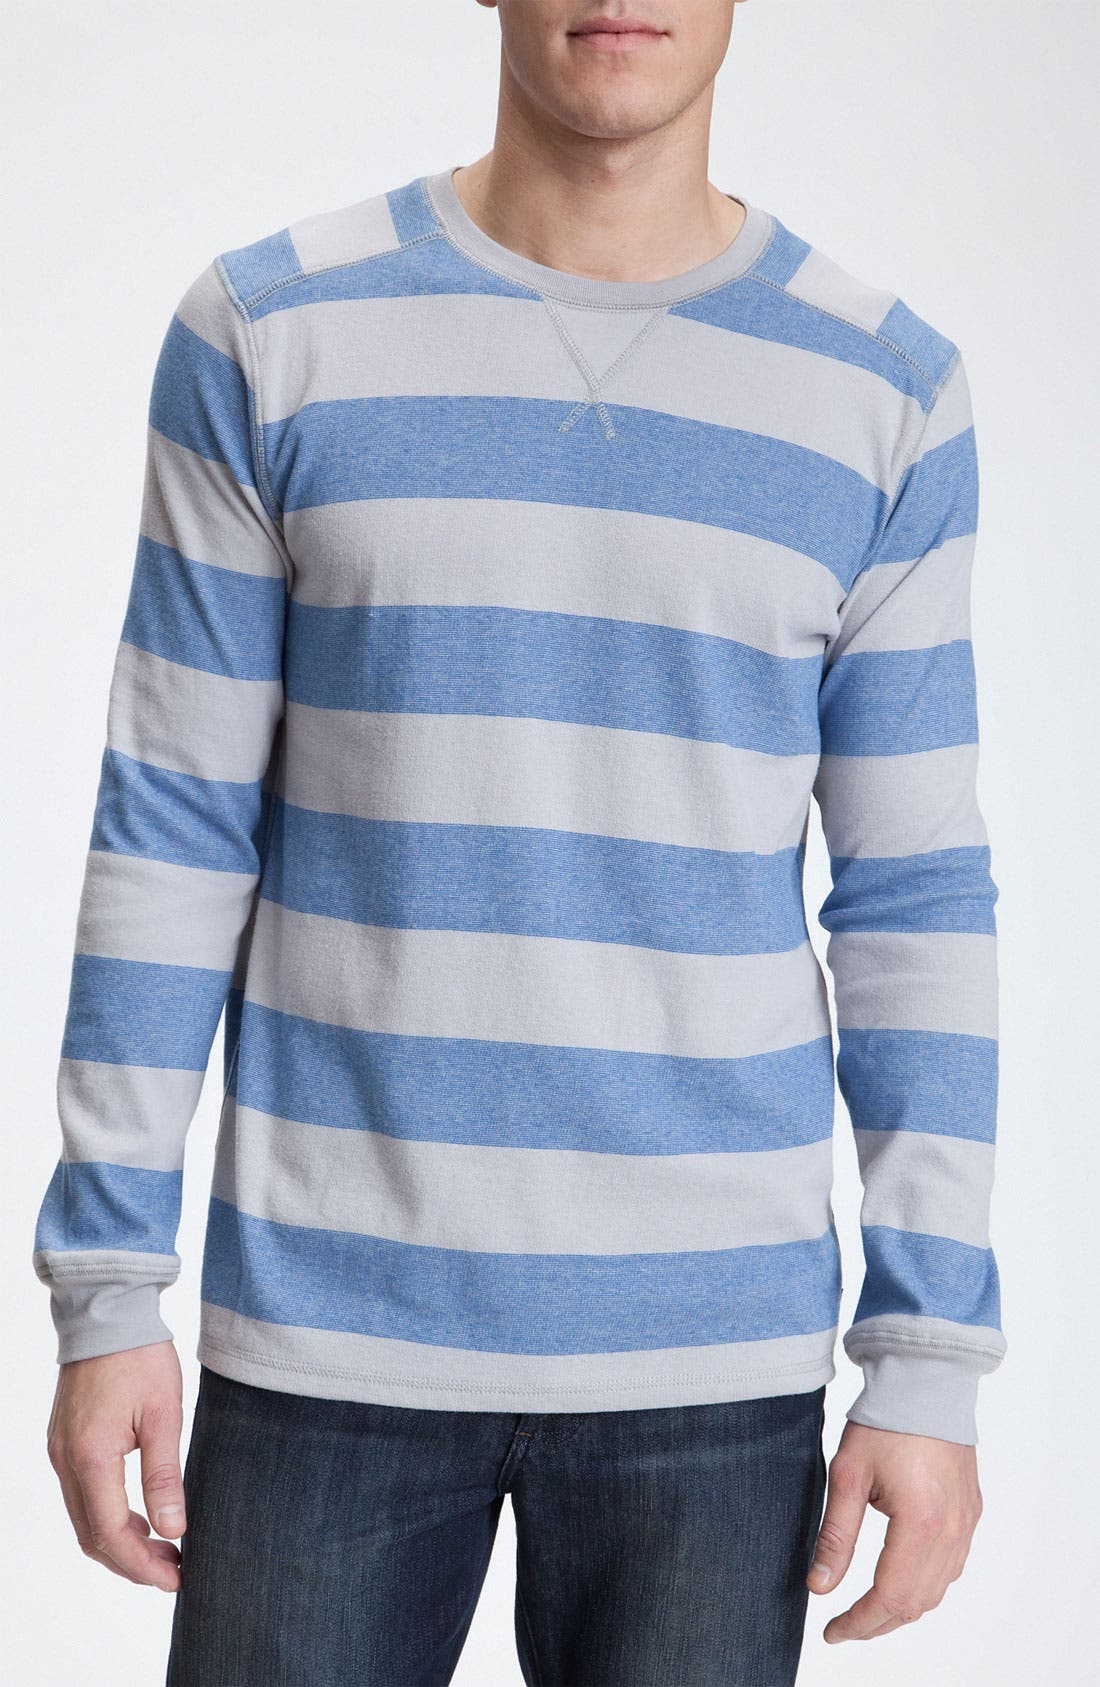 Alternate Image 1 Selected - Quiksilver Long Sleeve Crewneck Shirt